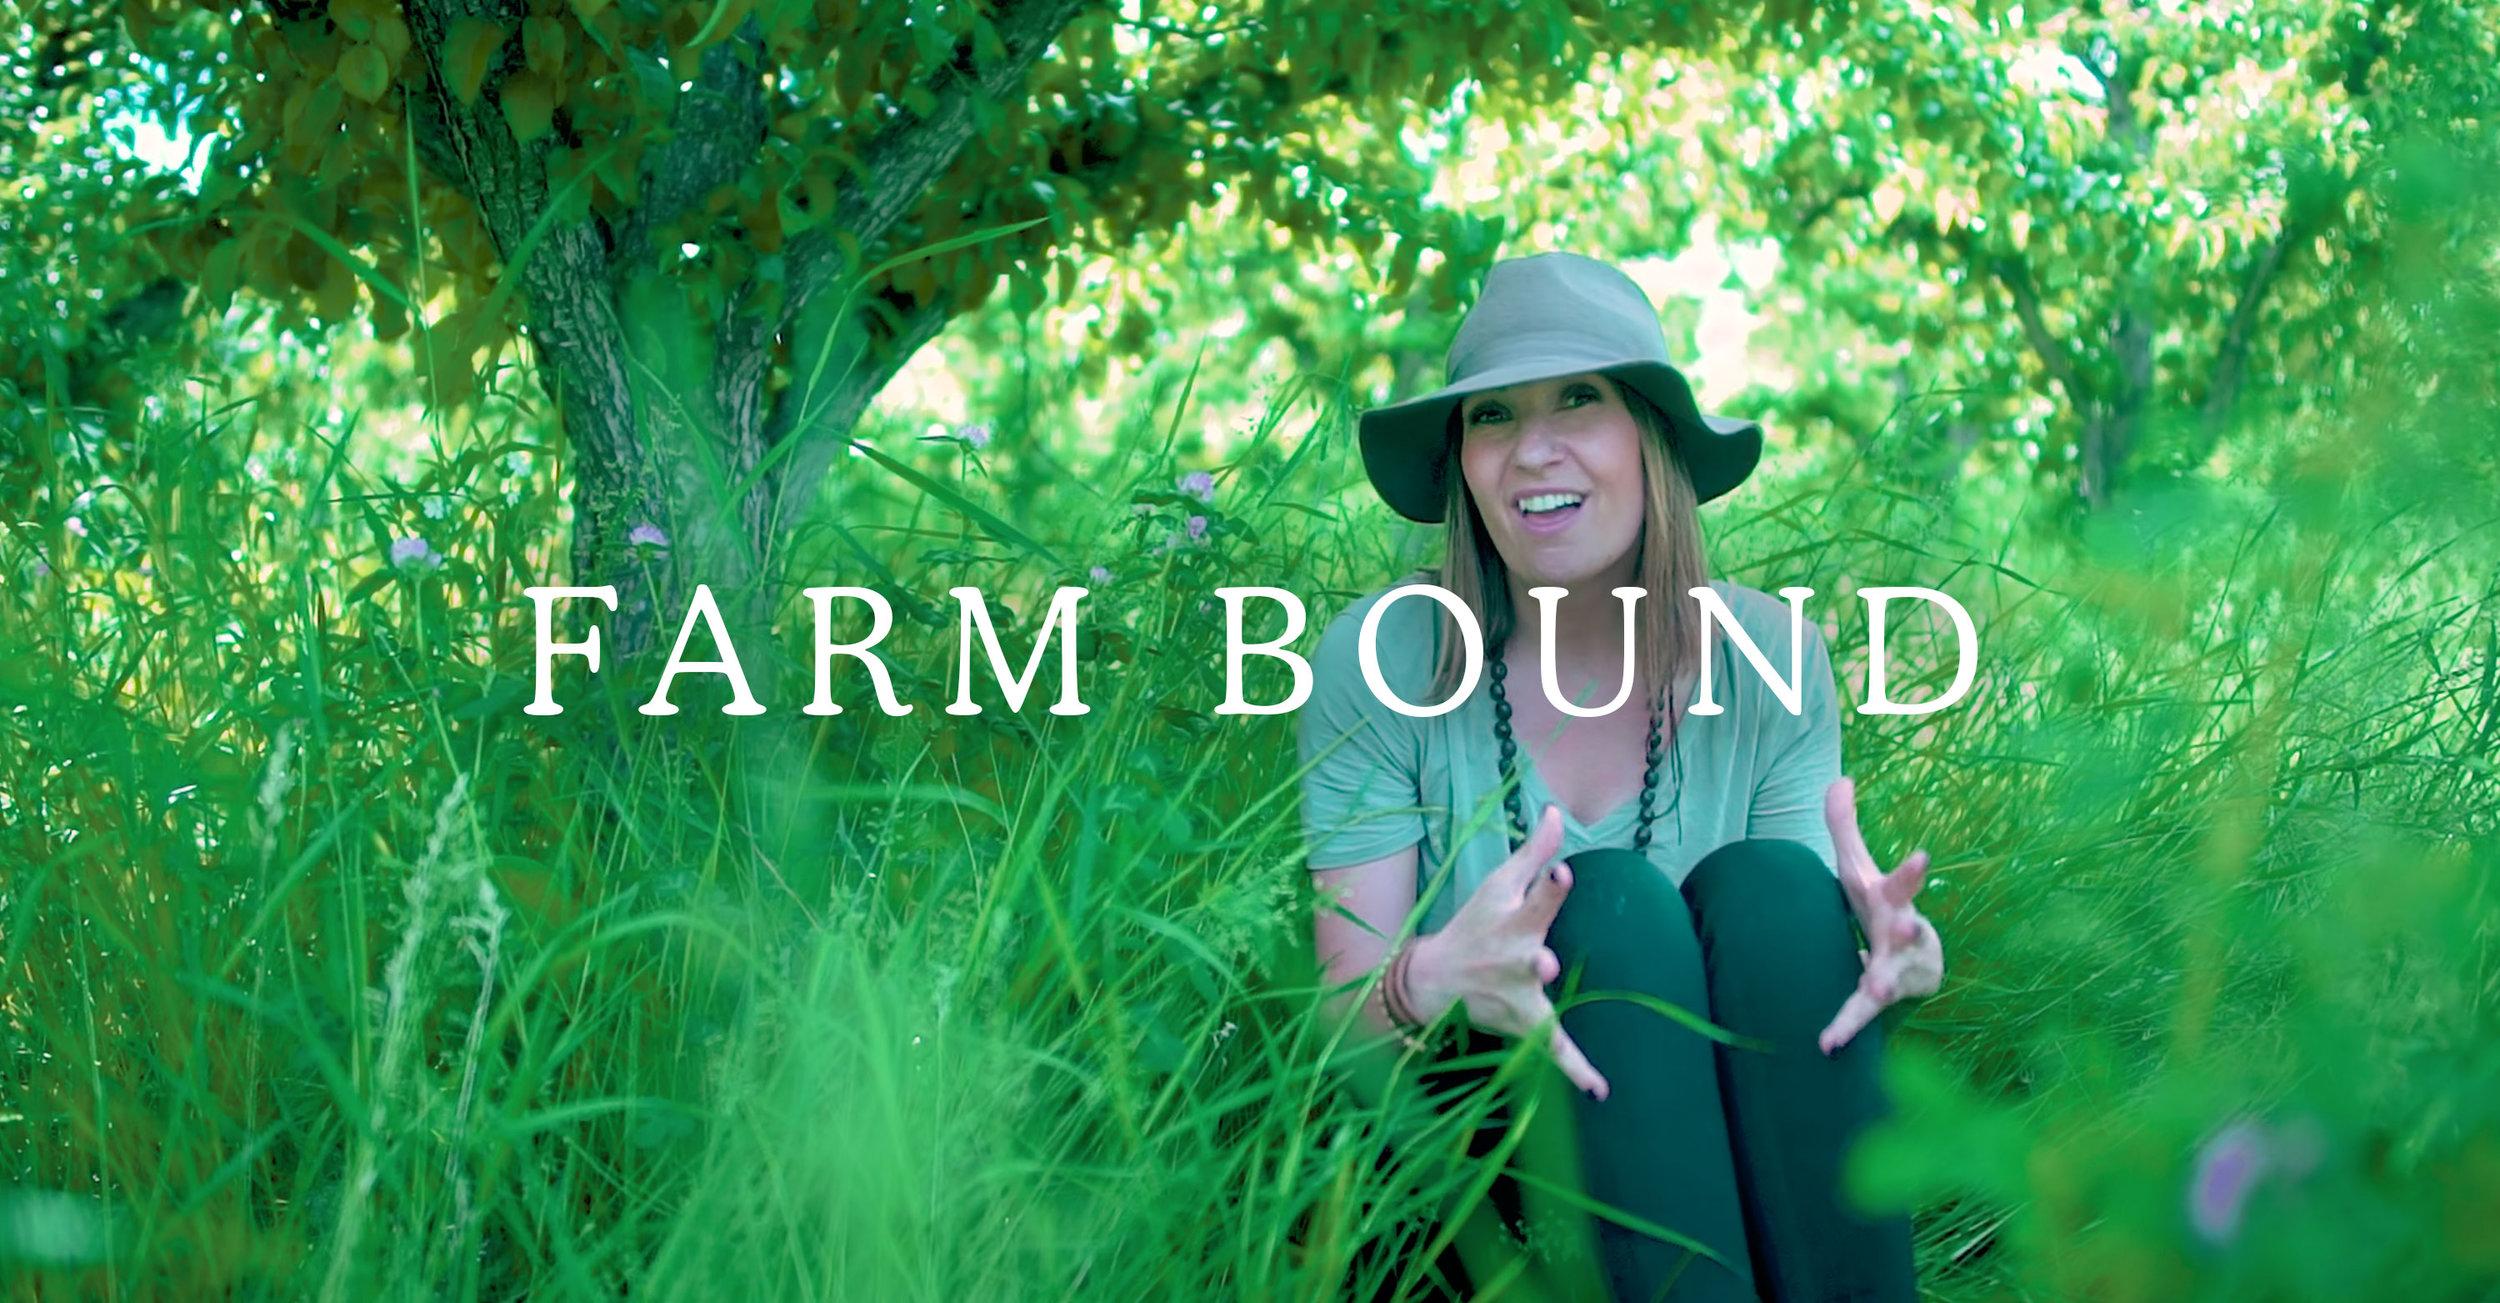 creative-page-farmbound.jpg